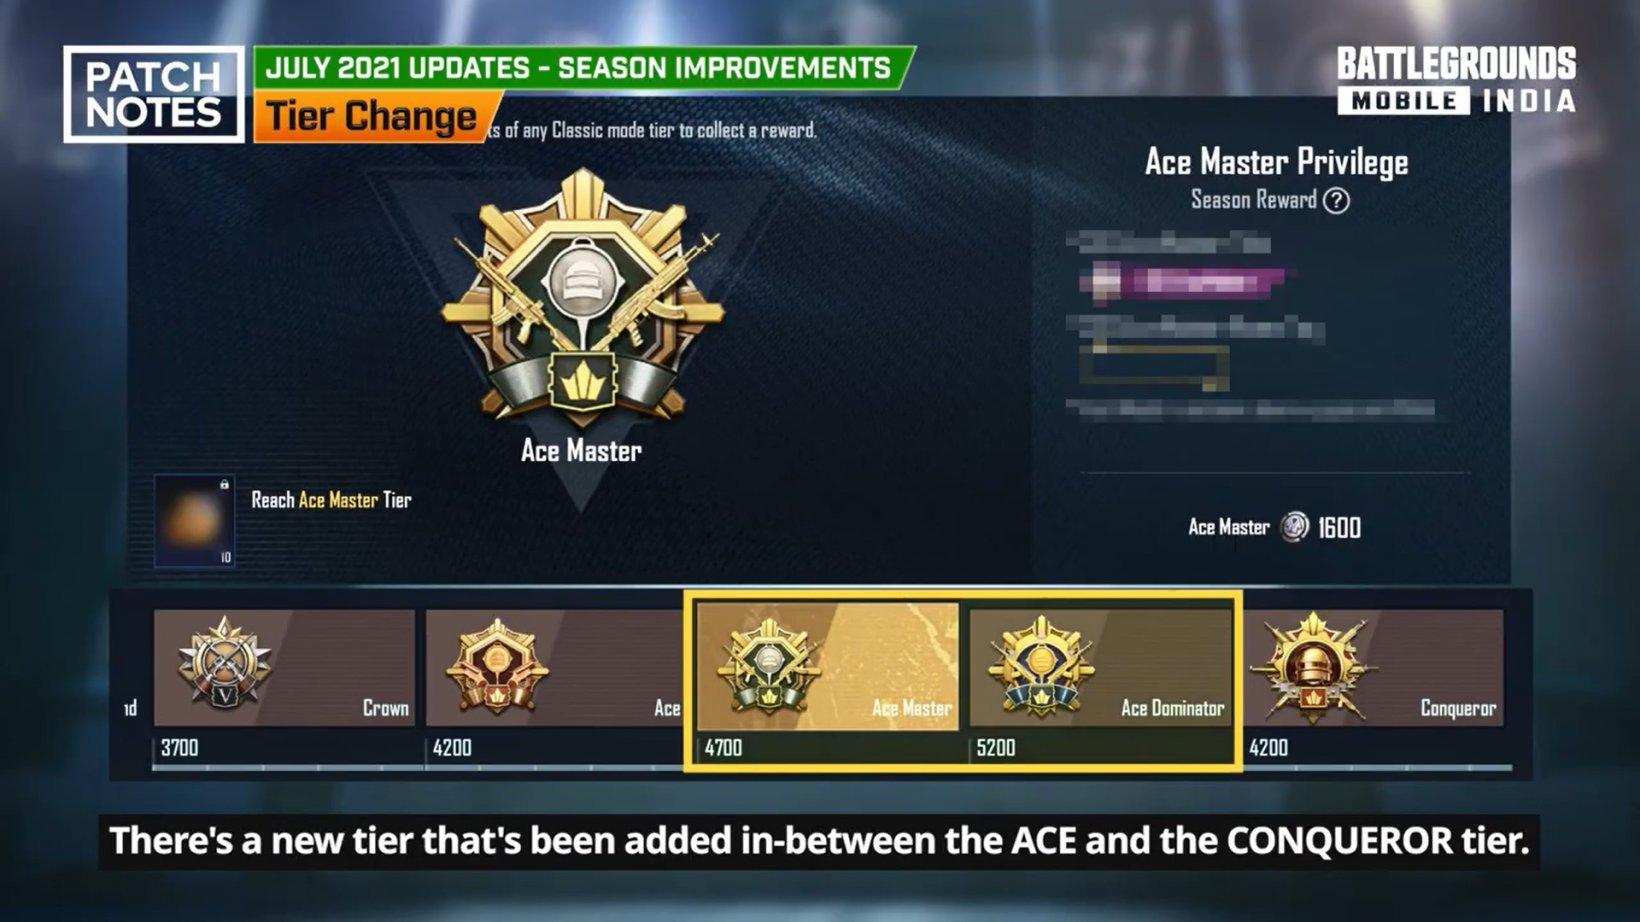 bgmi two new ranks